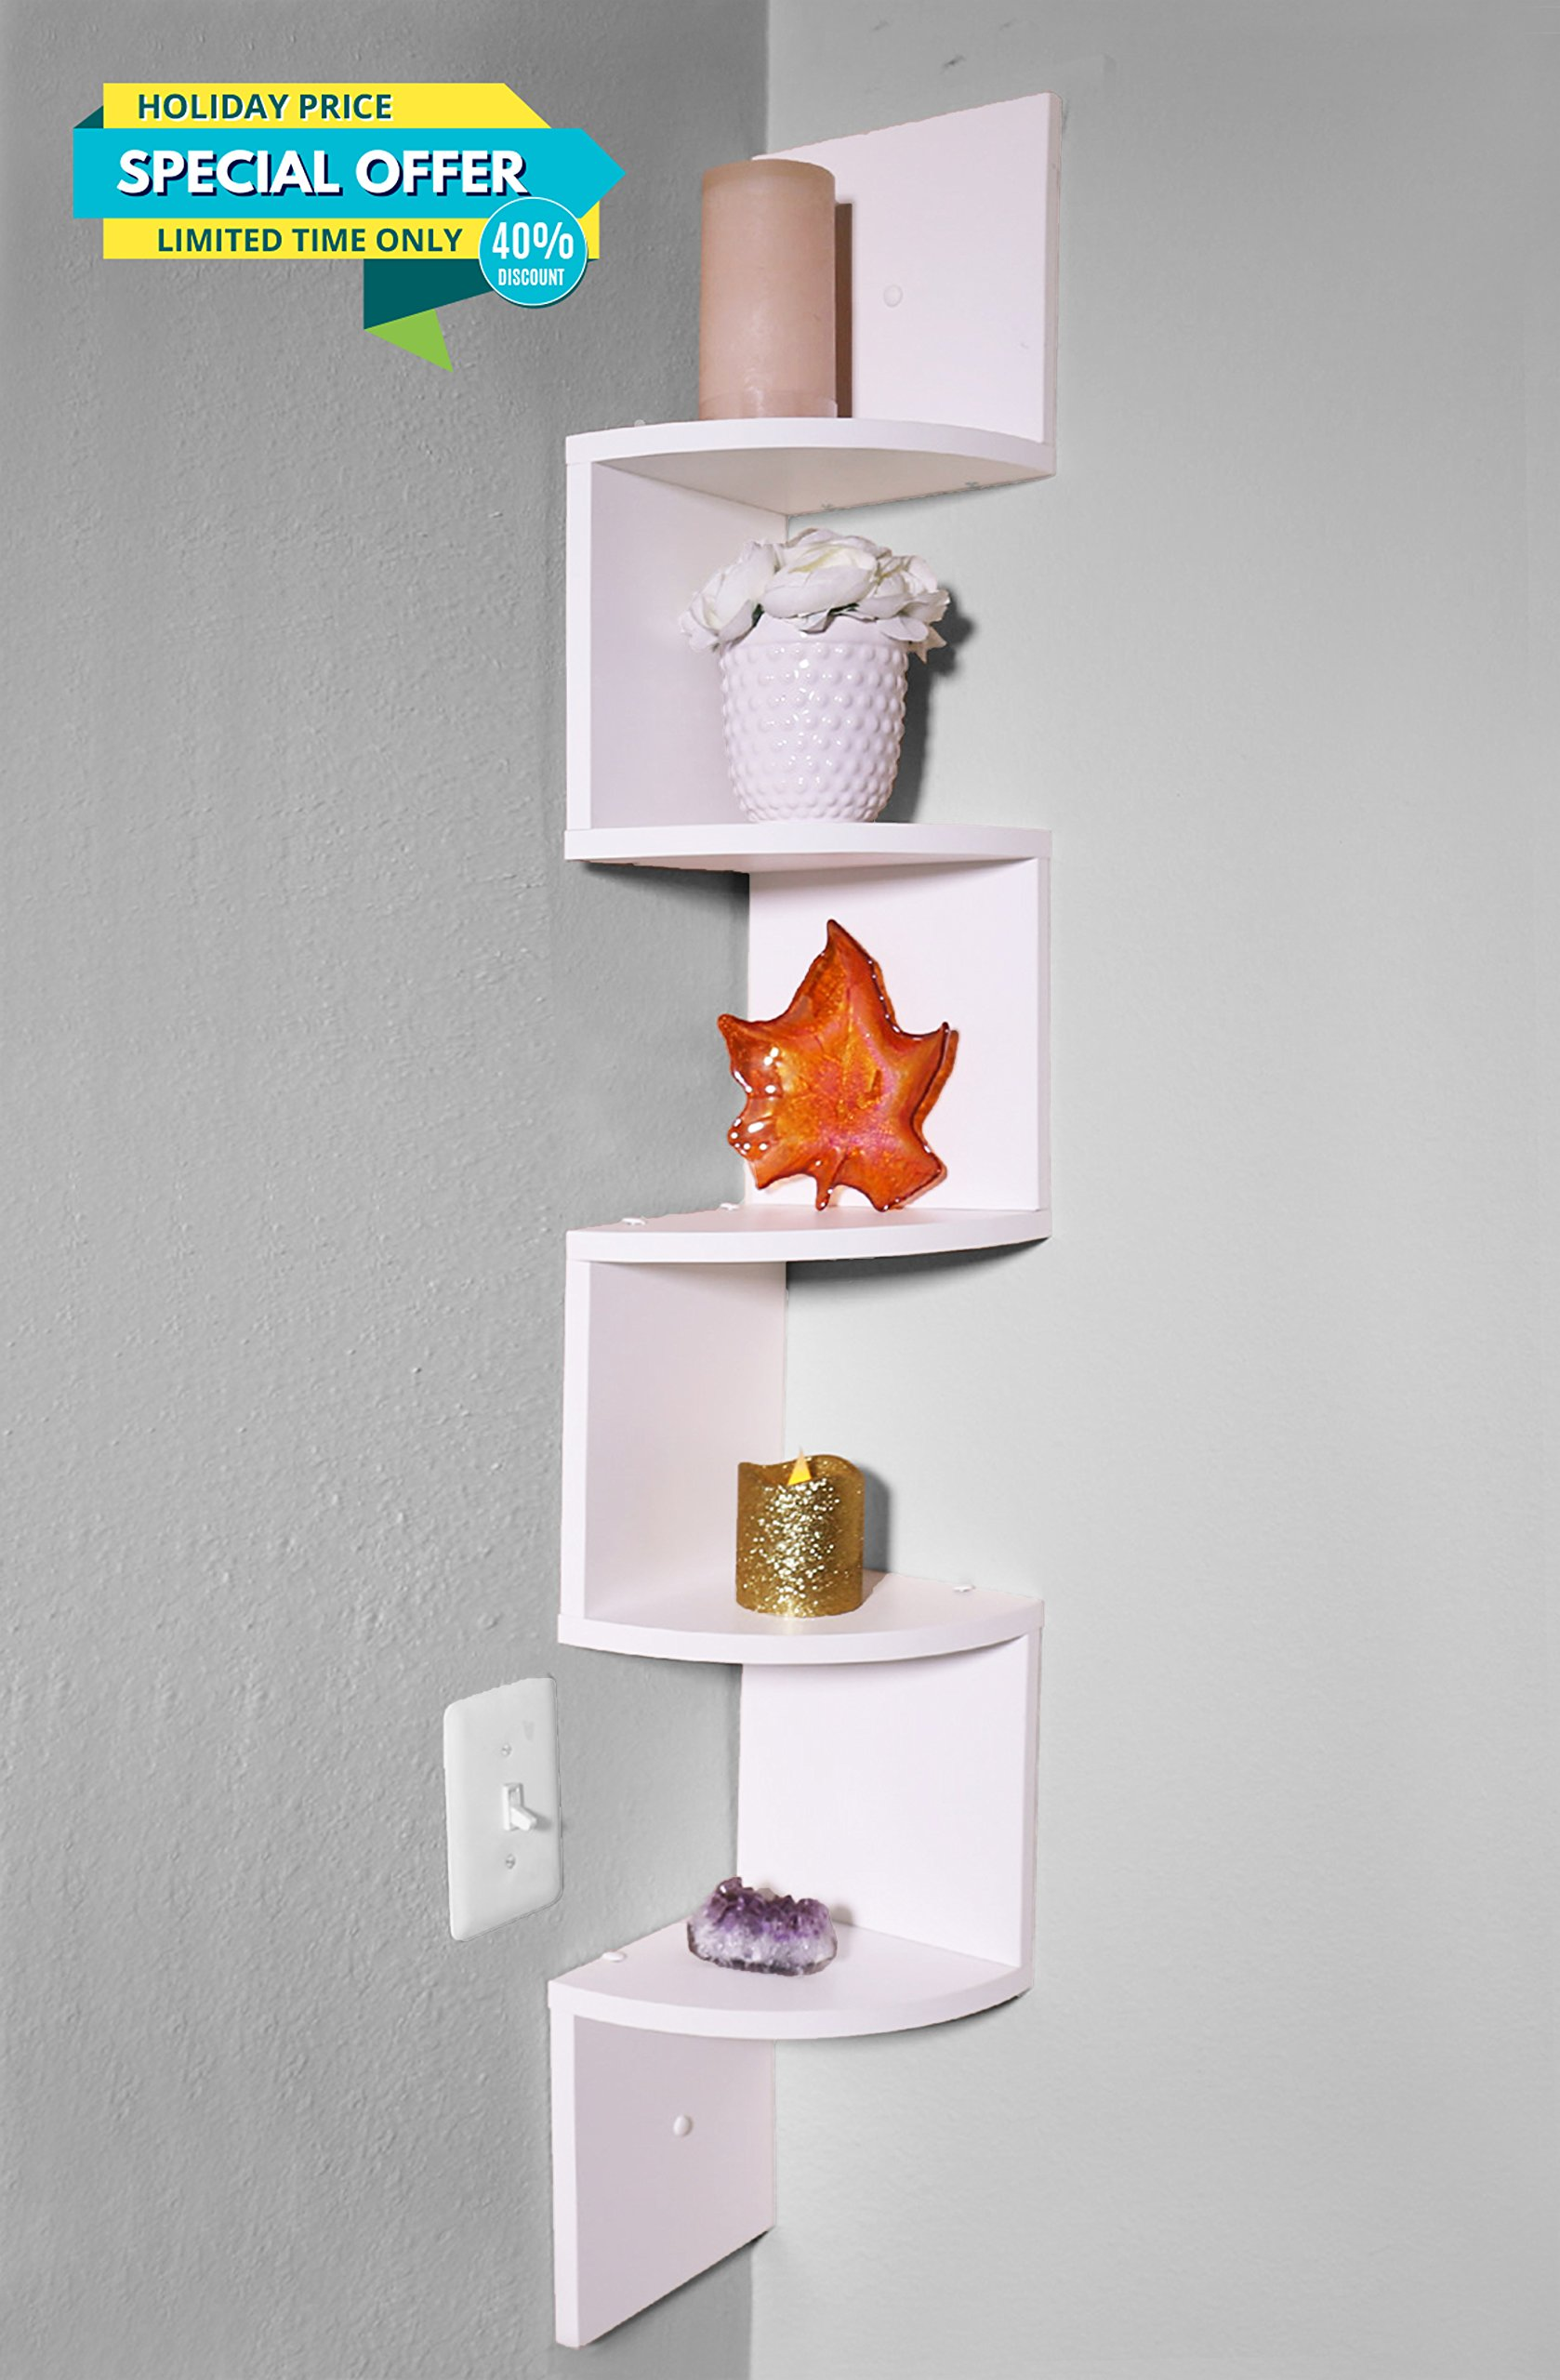 Adorn Home Essentials| Corner Zig Zag Wall Mount Shelves| 5-Tier, White Shelves